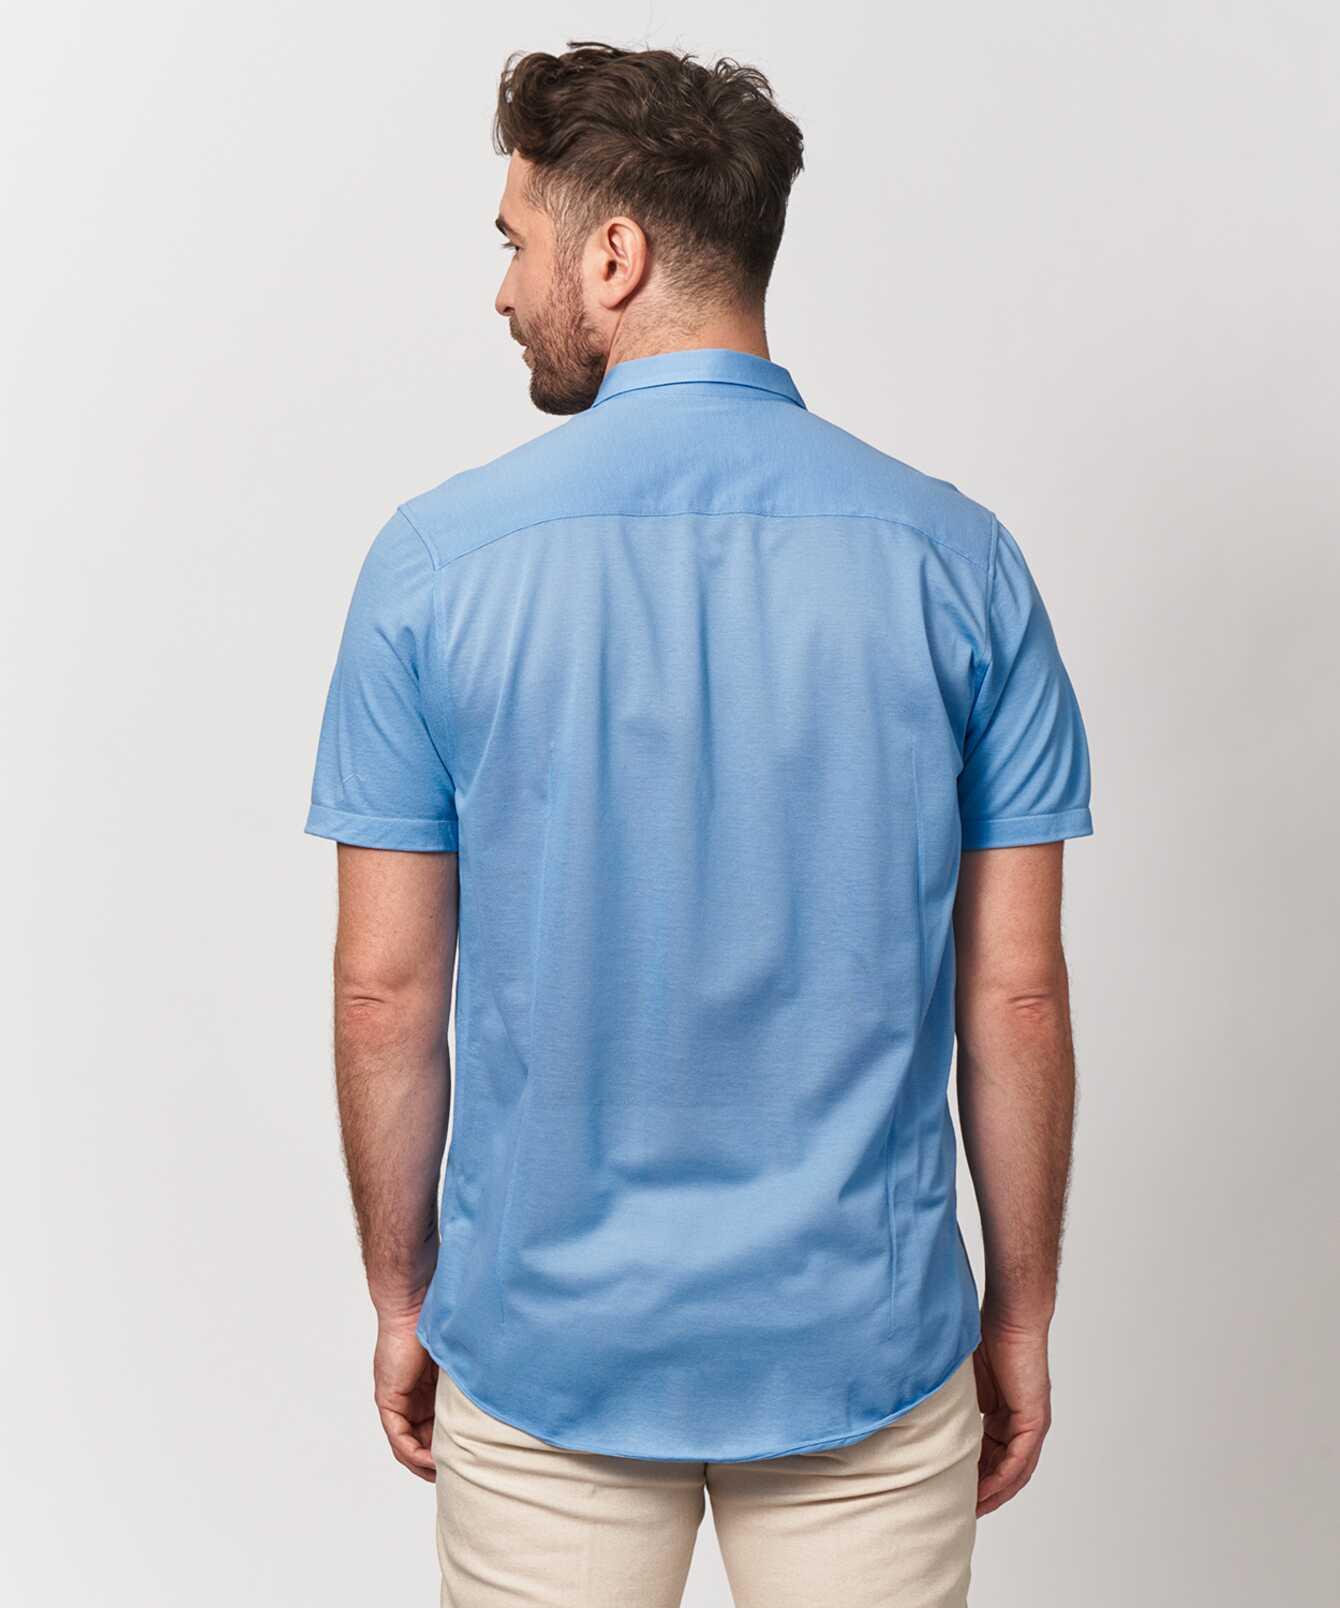 Shirt Royal Troon Poloshirt Short-Sleeve The Shirt Factory